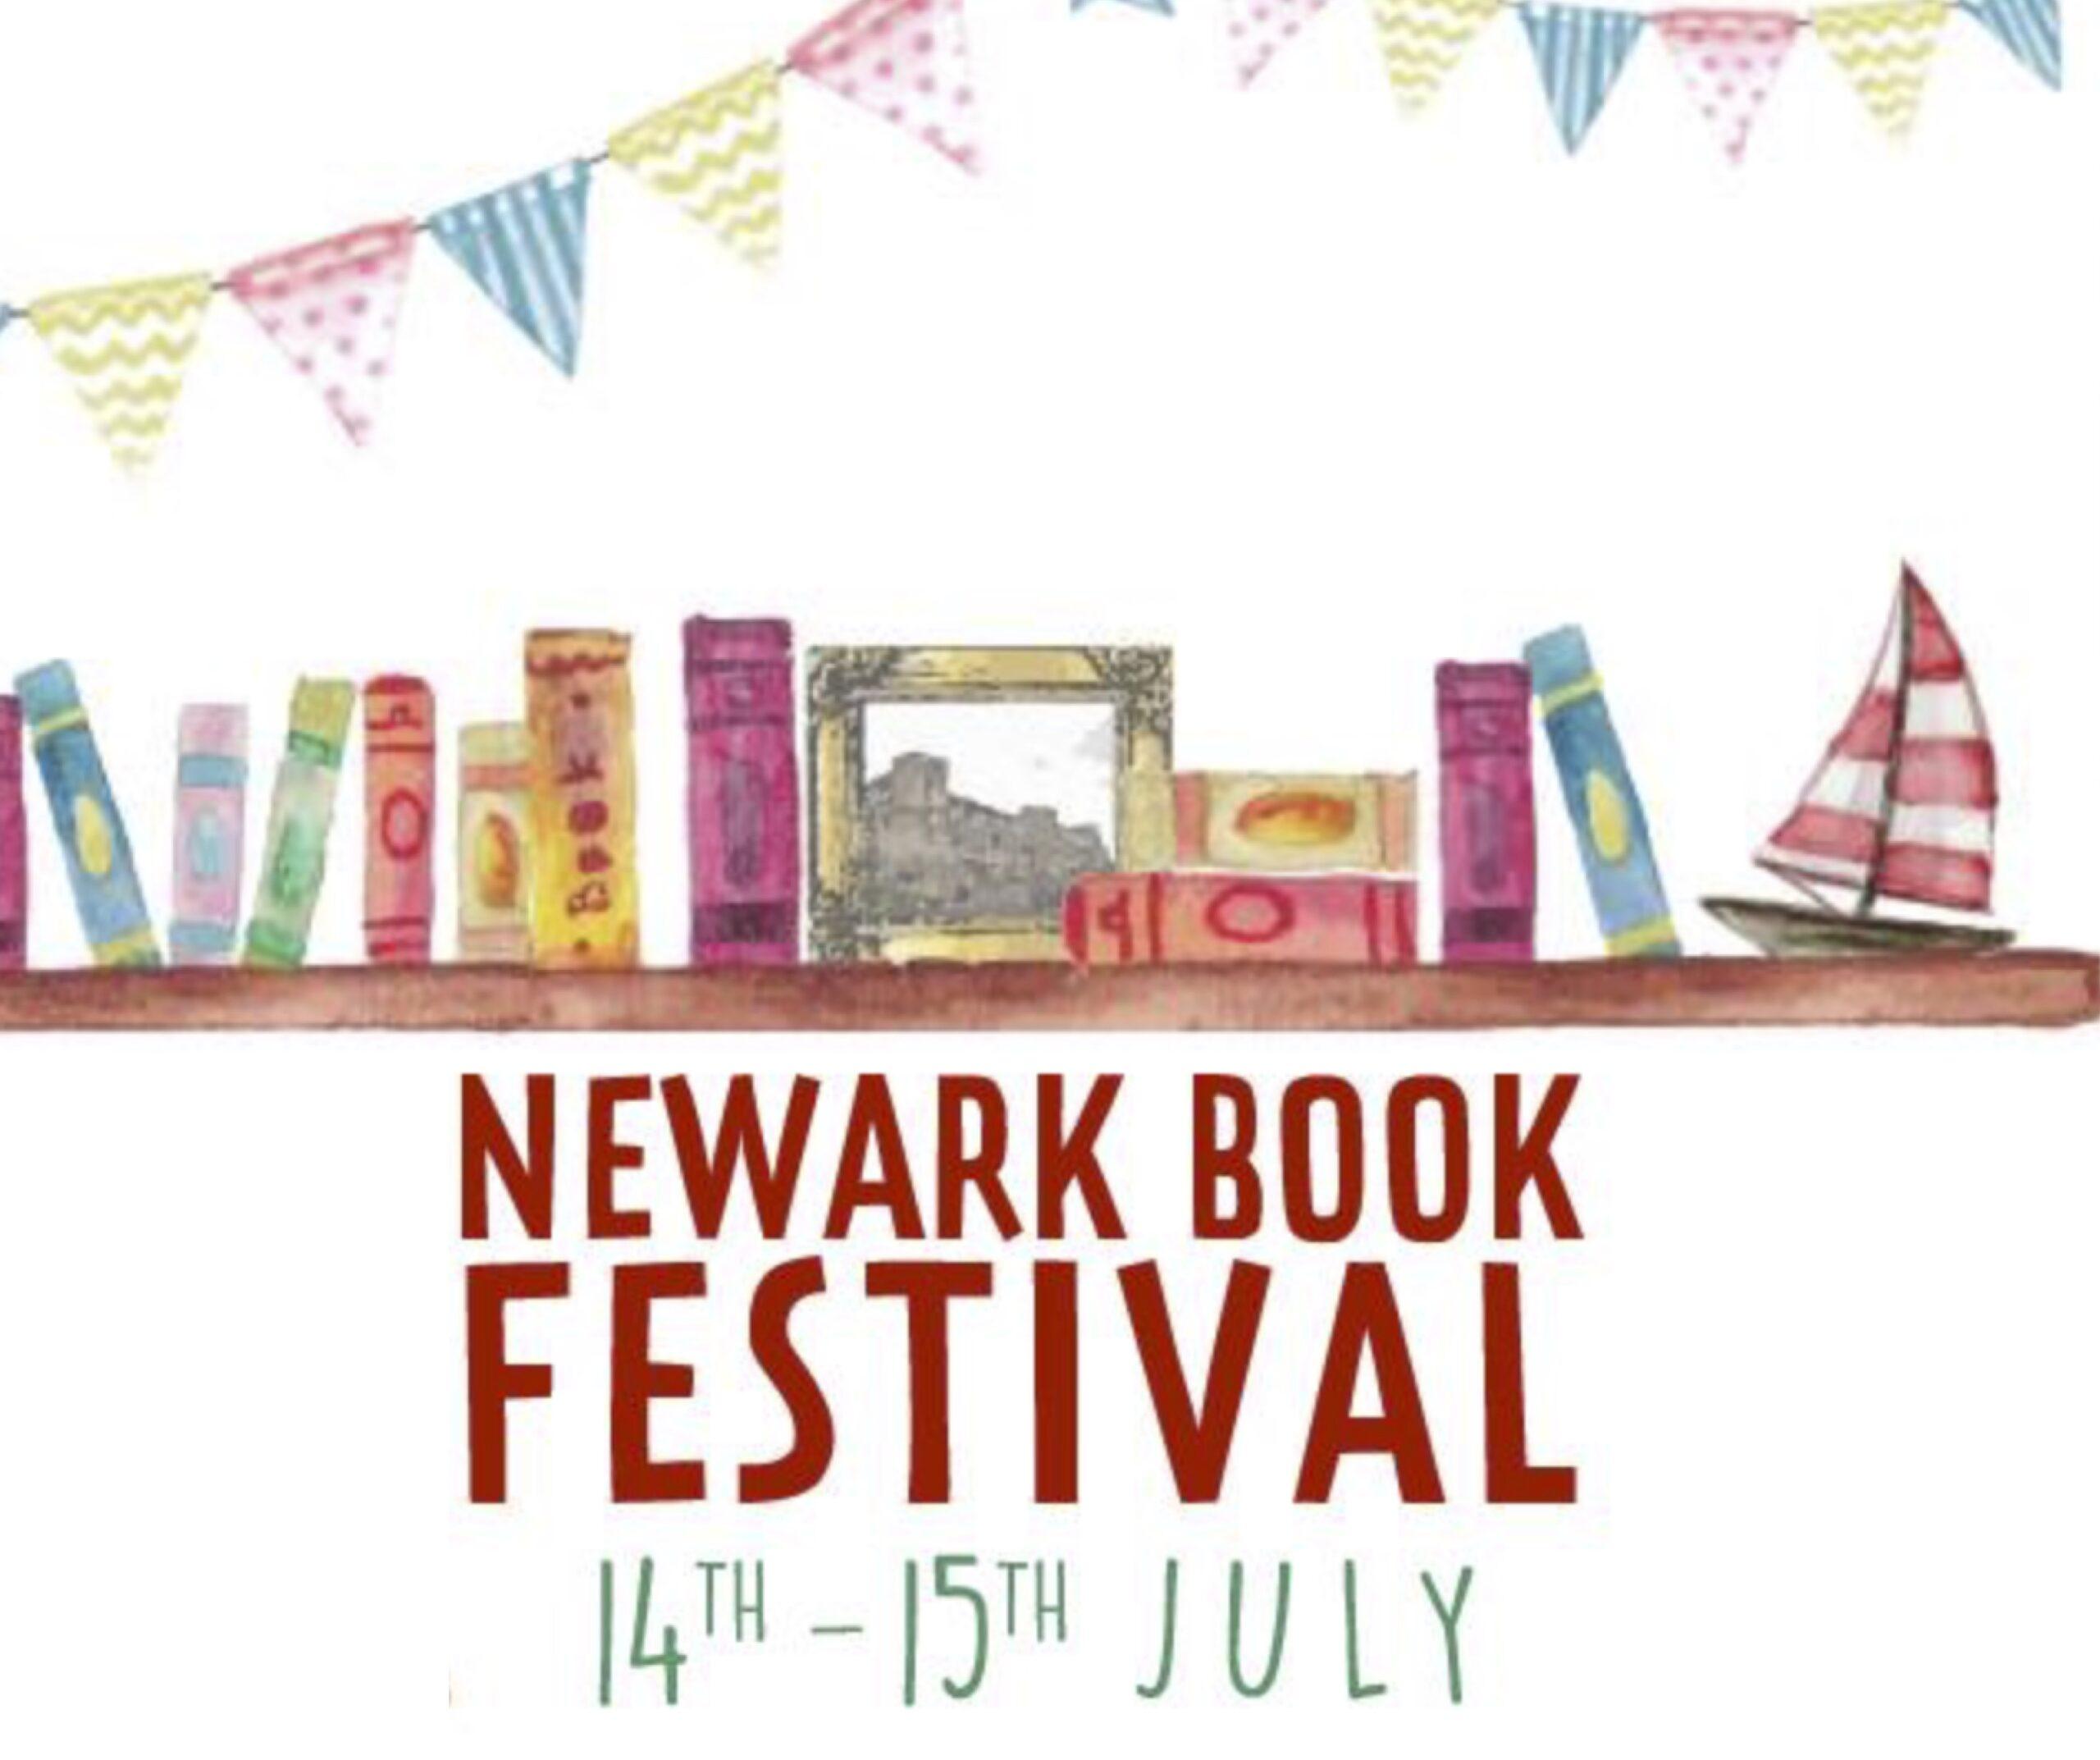 Tallents Solicitors is proud to sponsor Newark Book Festival